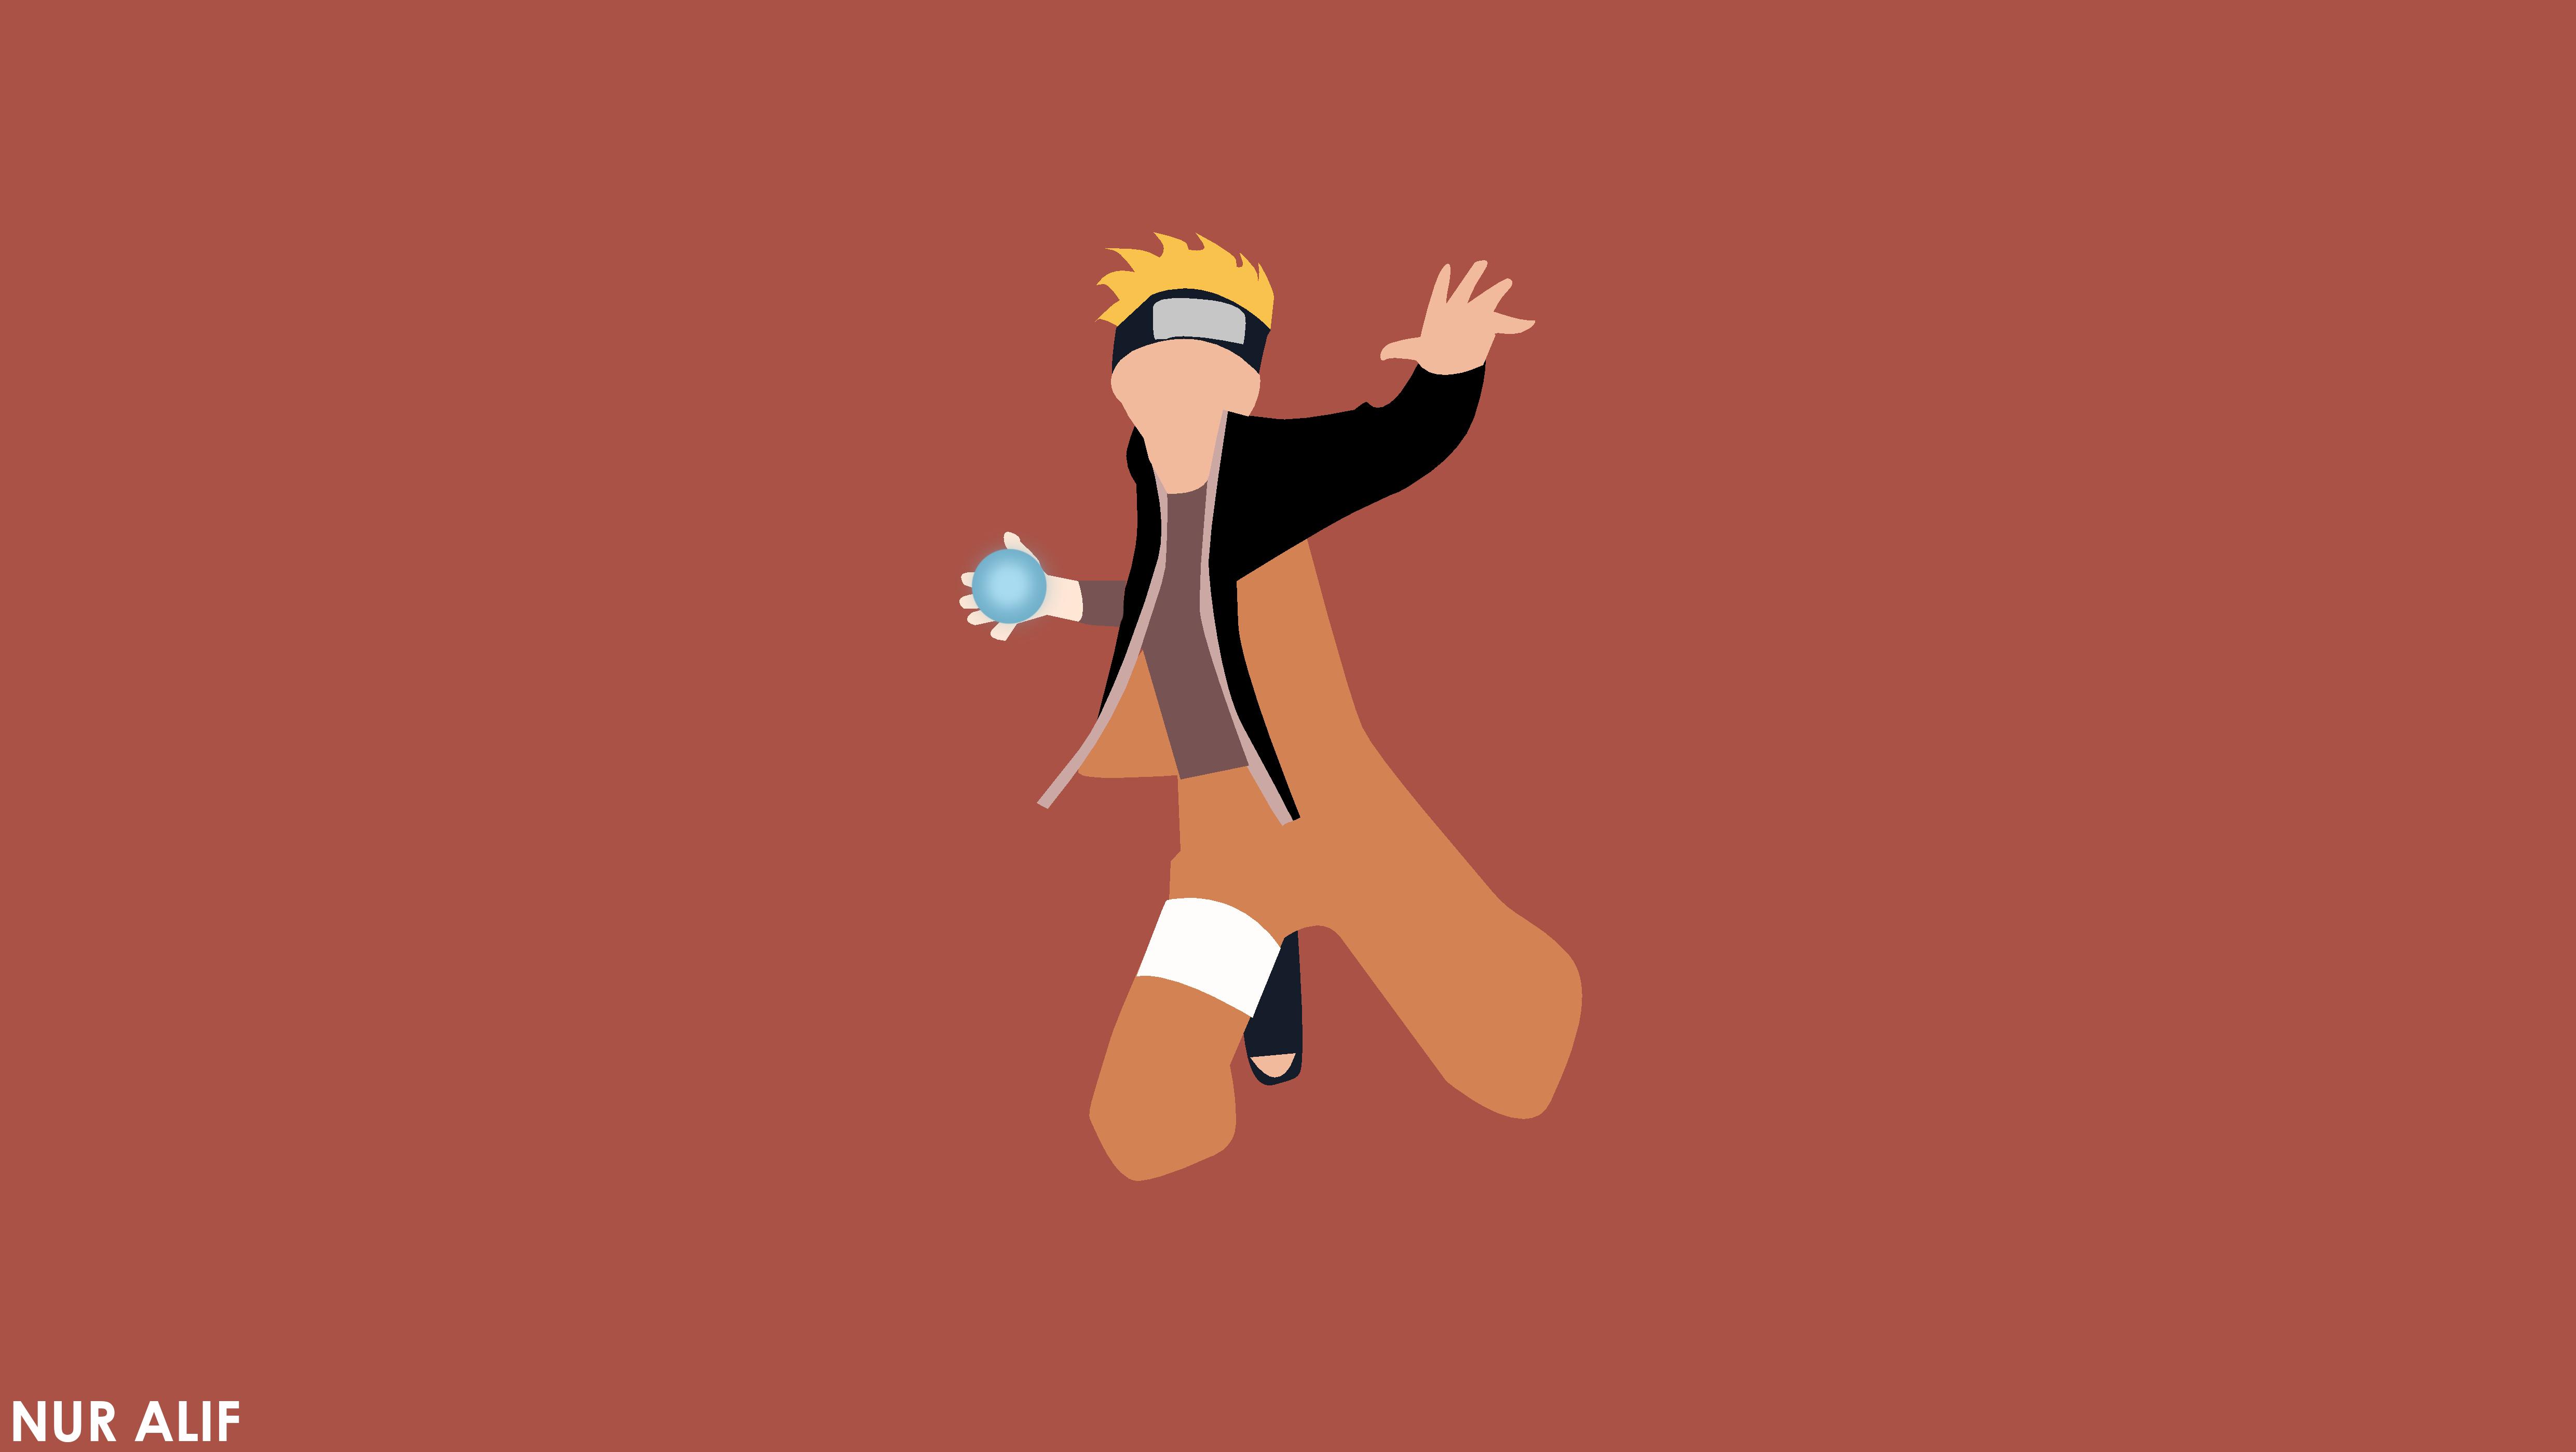 Naruto by NurAlifSidoel on DeviantArt